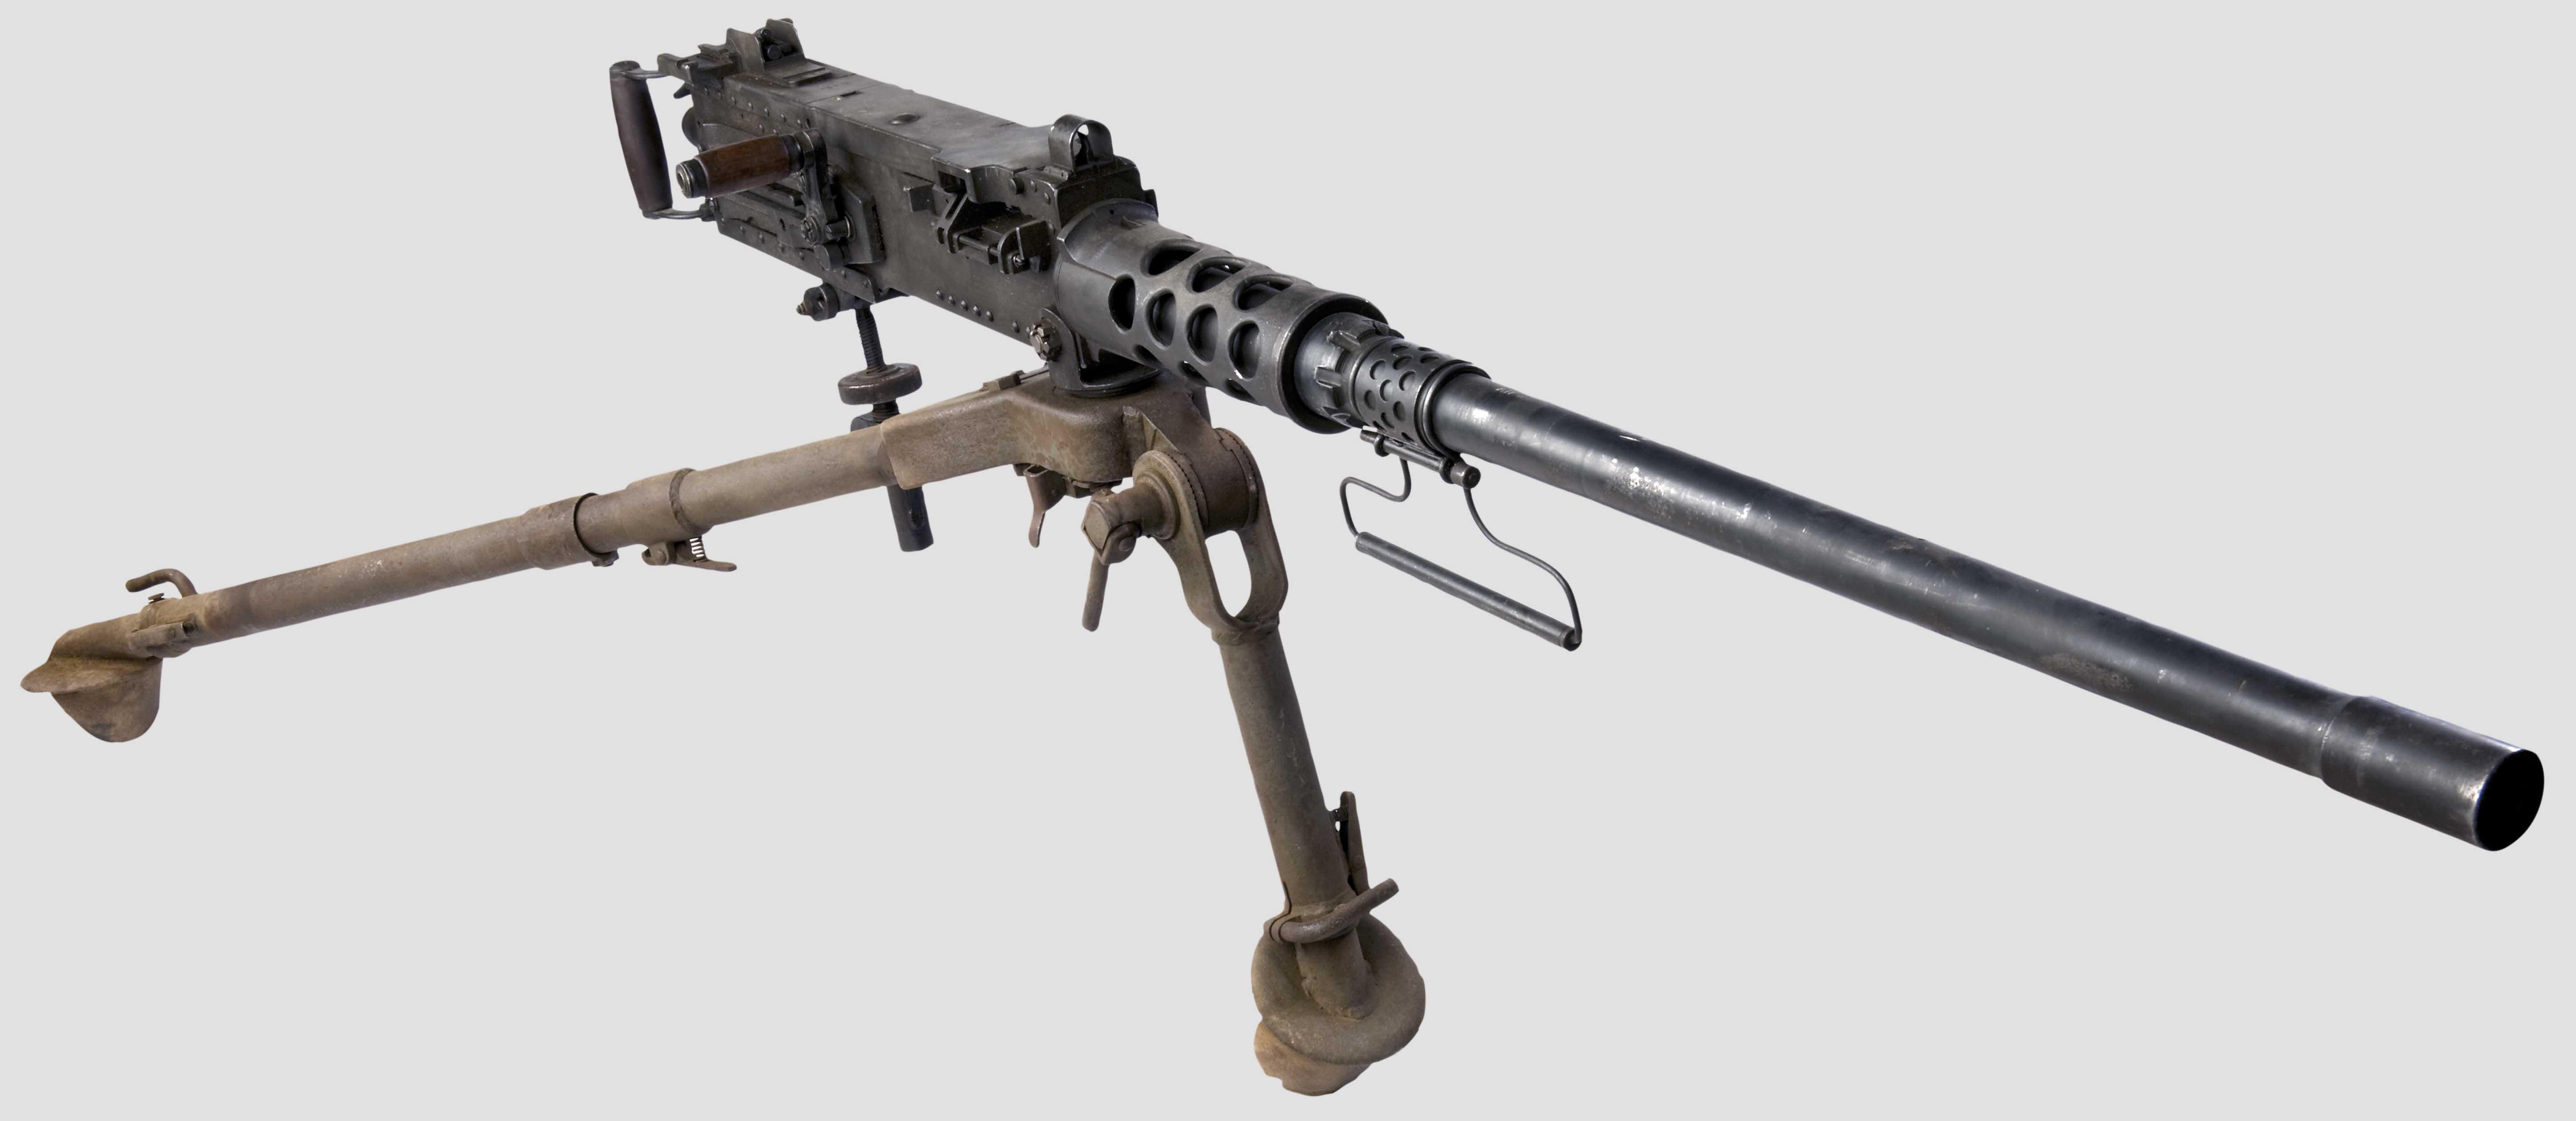 Browning M2 Machine Gun Wallpapers Weapons Hq Browning